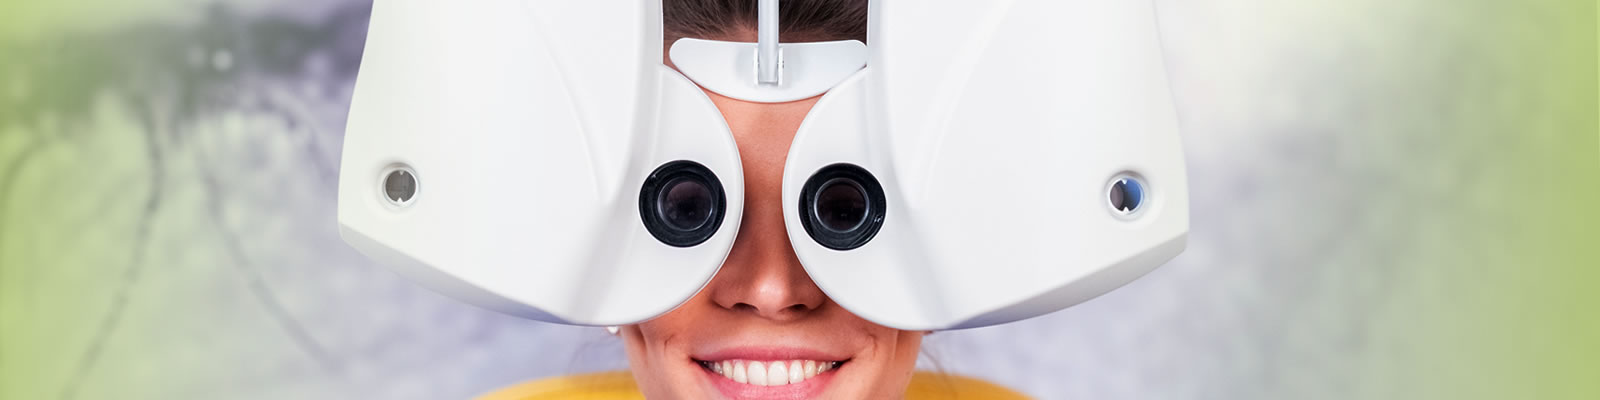 Optometrija in optika Manja